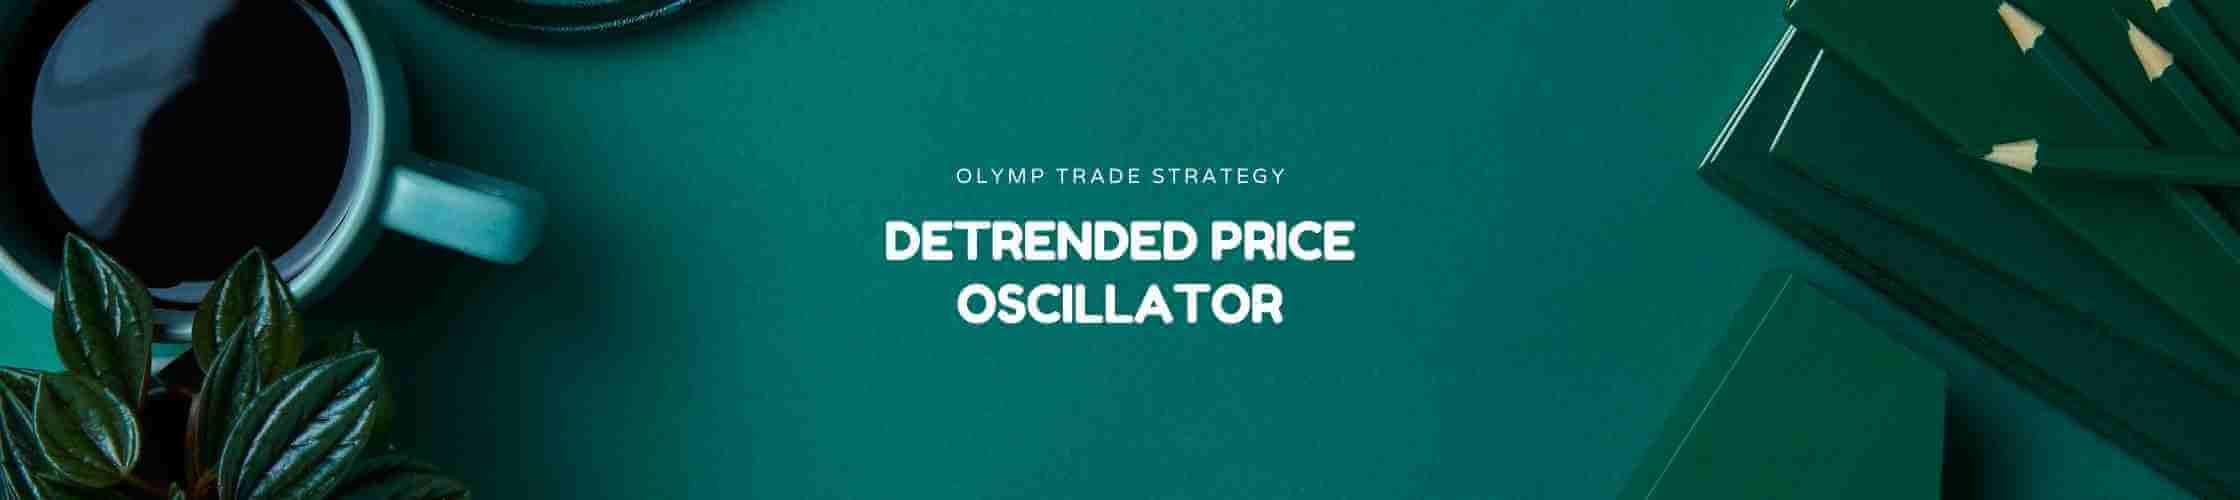 Detrended Price Oscillator Olymp Trade